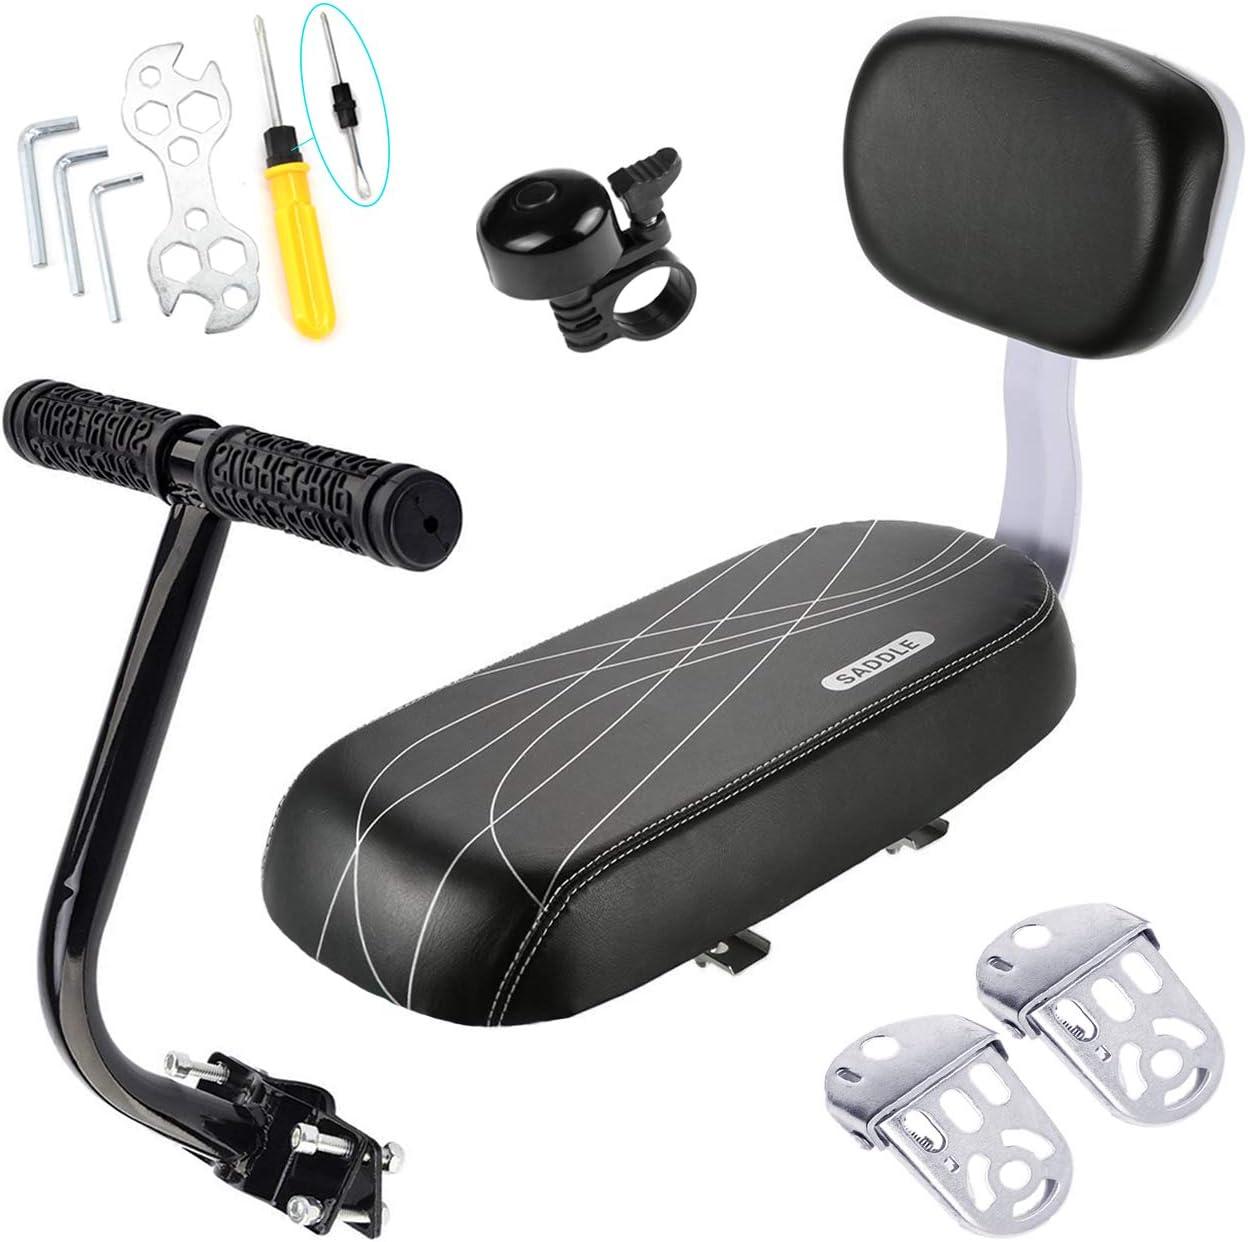 CenterZ Bike Rear Seat Cushion with Safety Backrest + Backseat Armrest Handrail + Foldable Hidden Bicycle Footrests + Handlebar Bell (Universal Cycling Kit + Installing Repairing Tools Set Bonus)